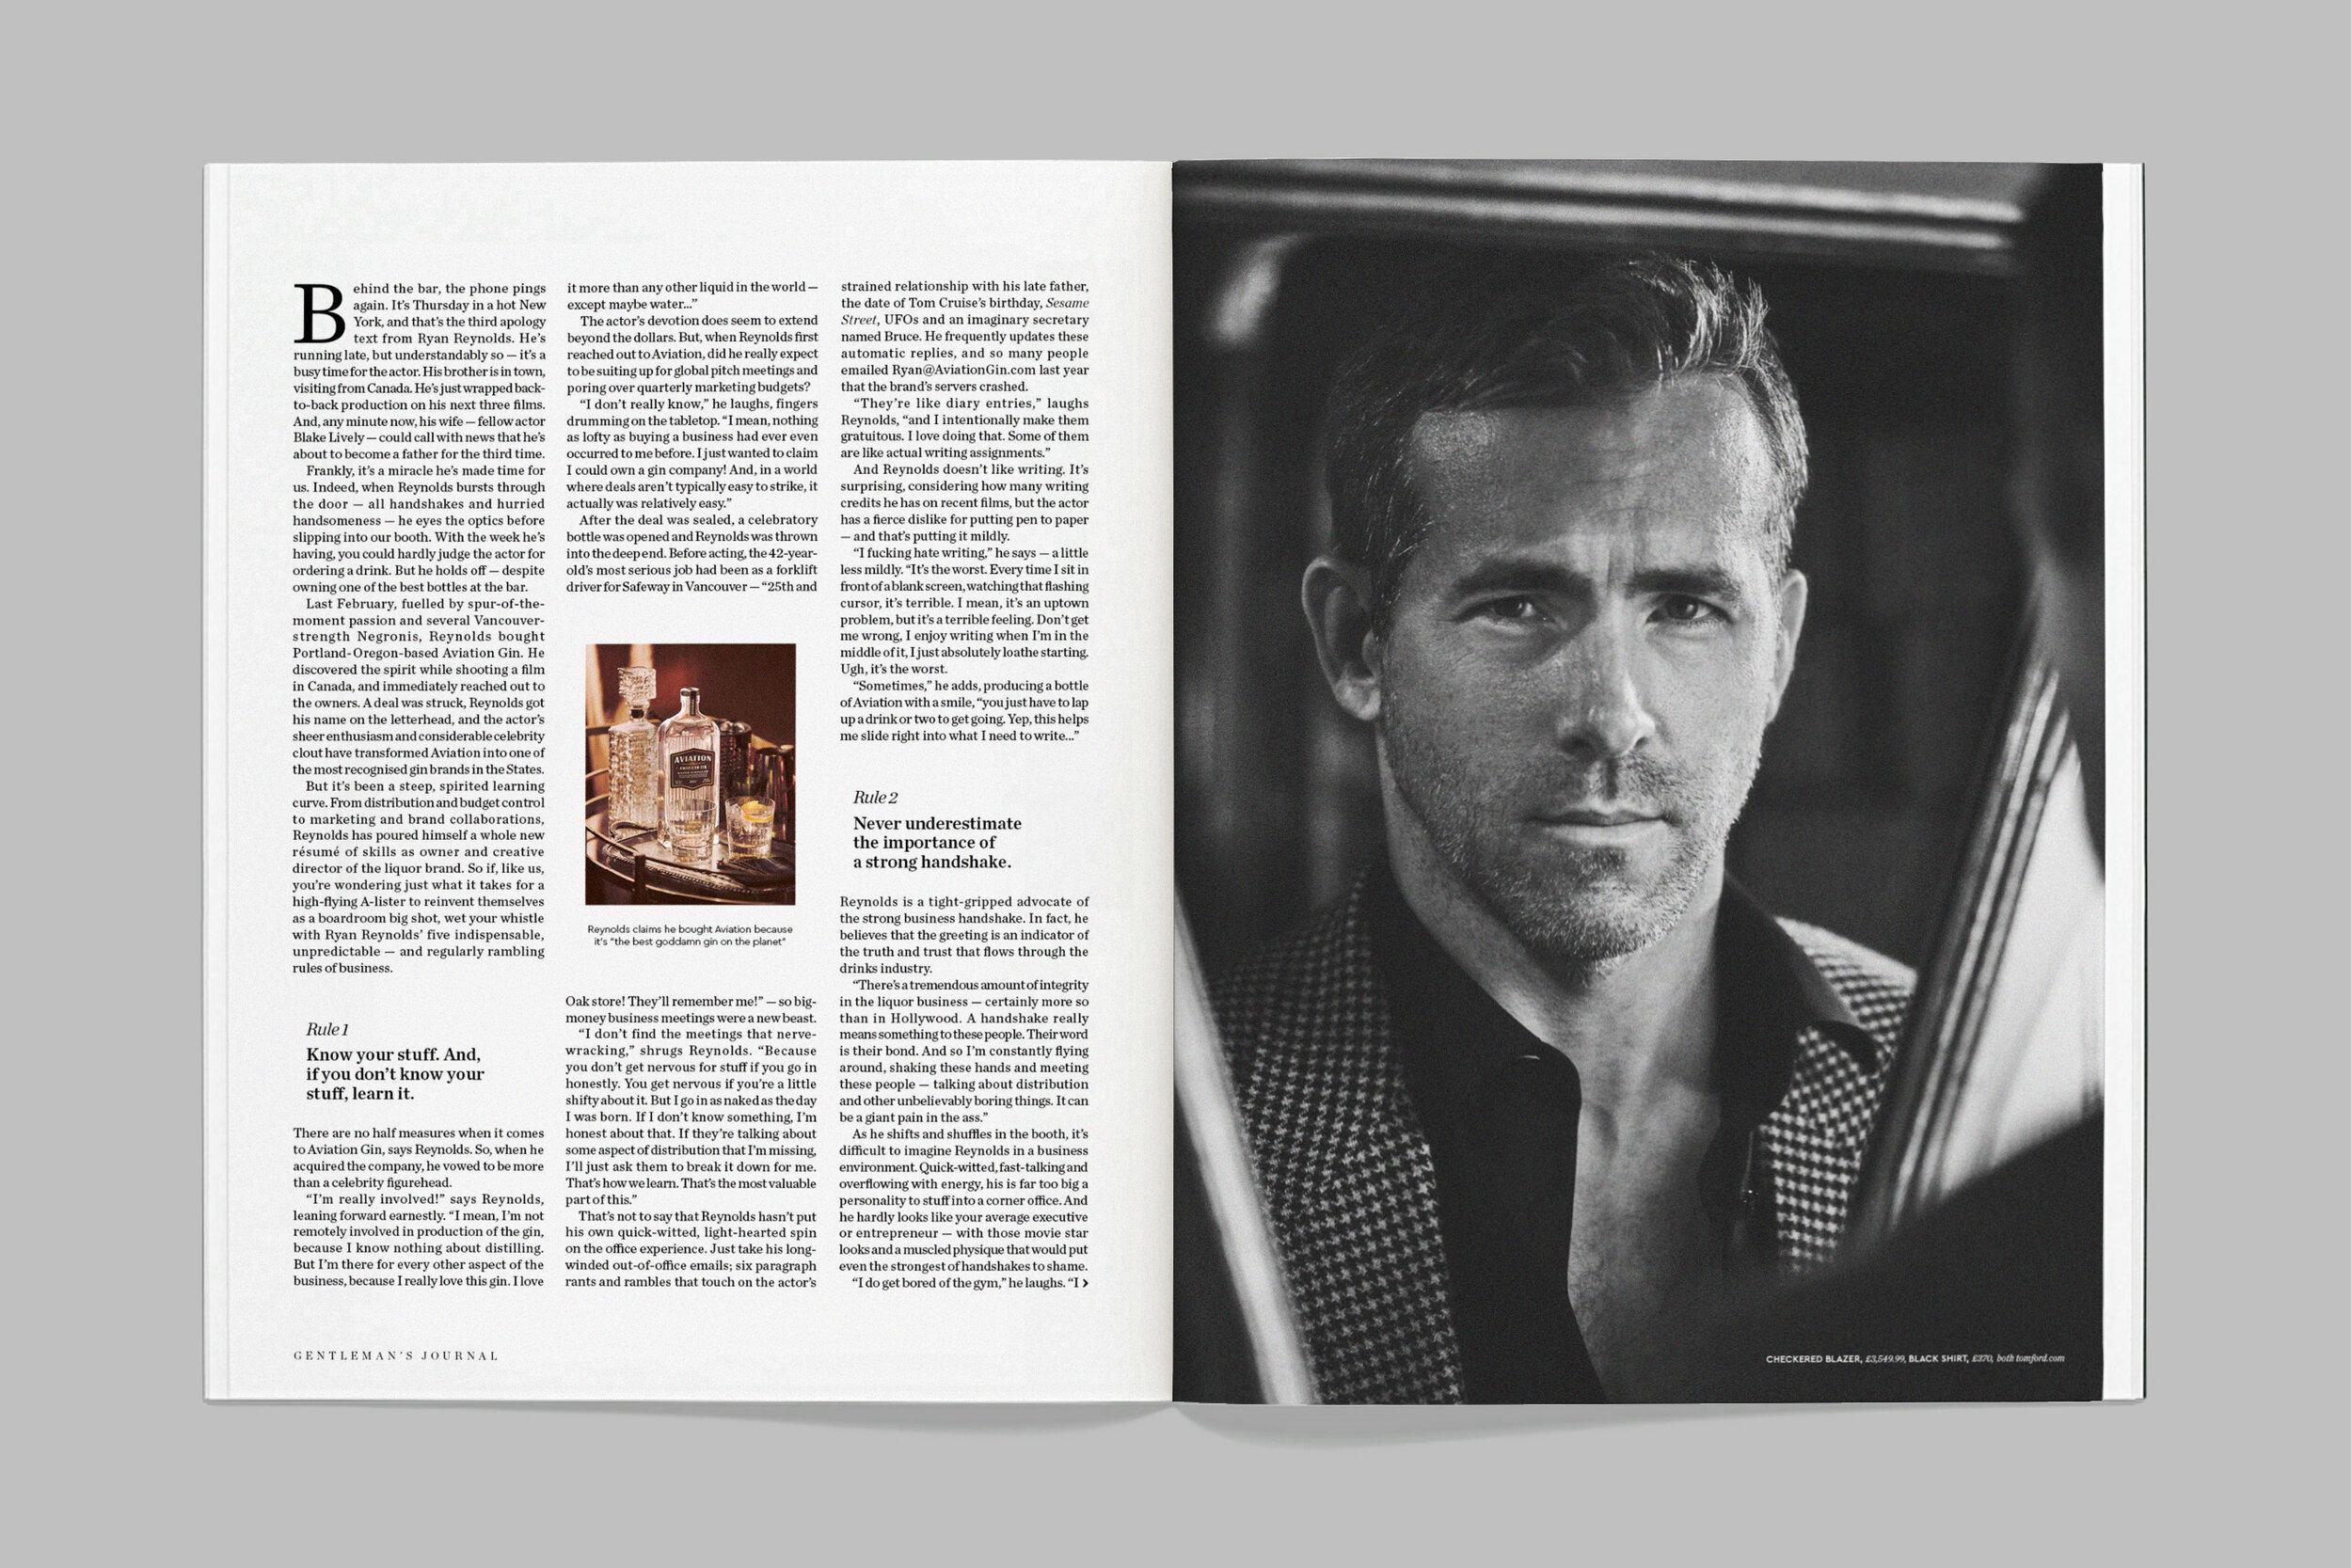 magazine_article_2.jpg